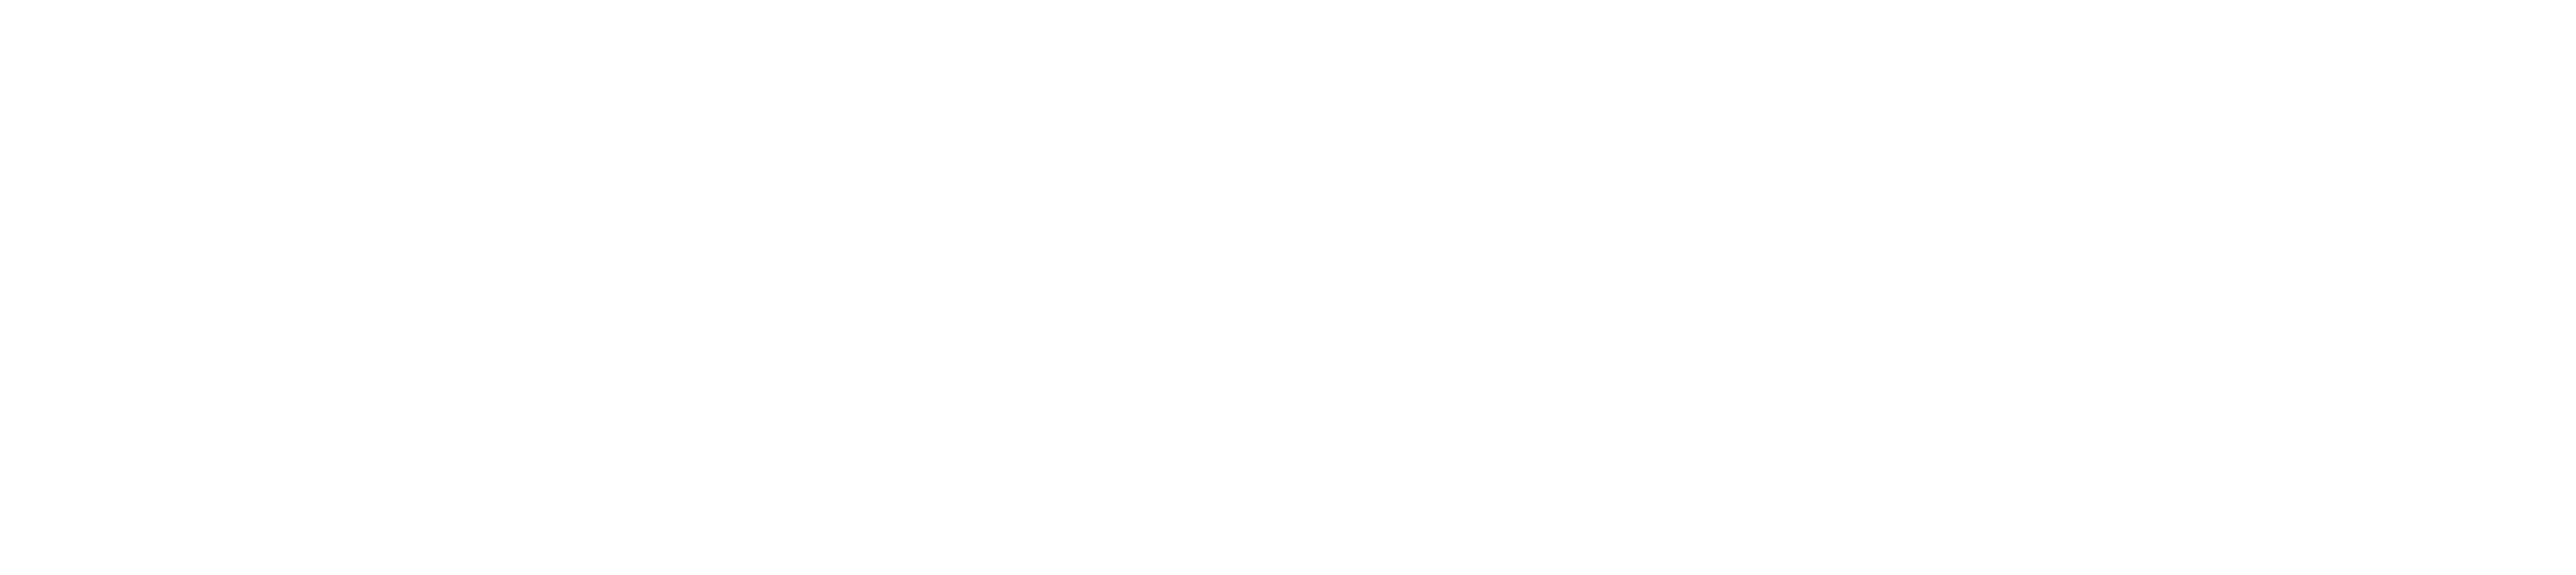 Liverpool City Champion